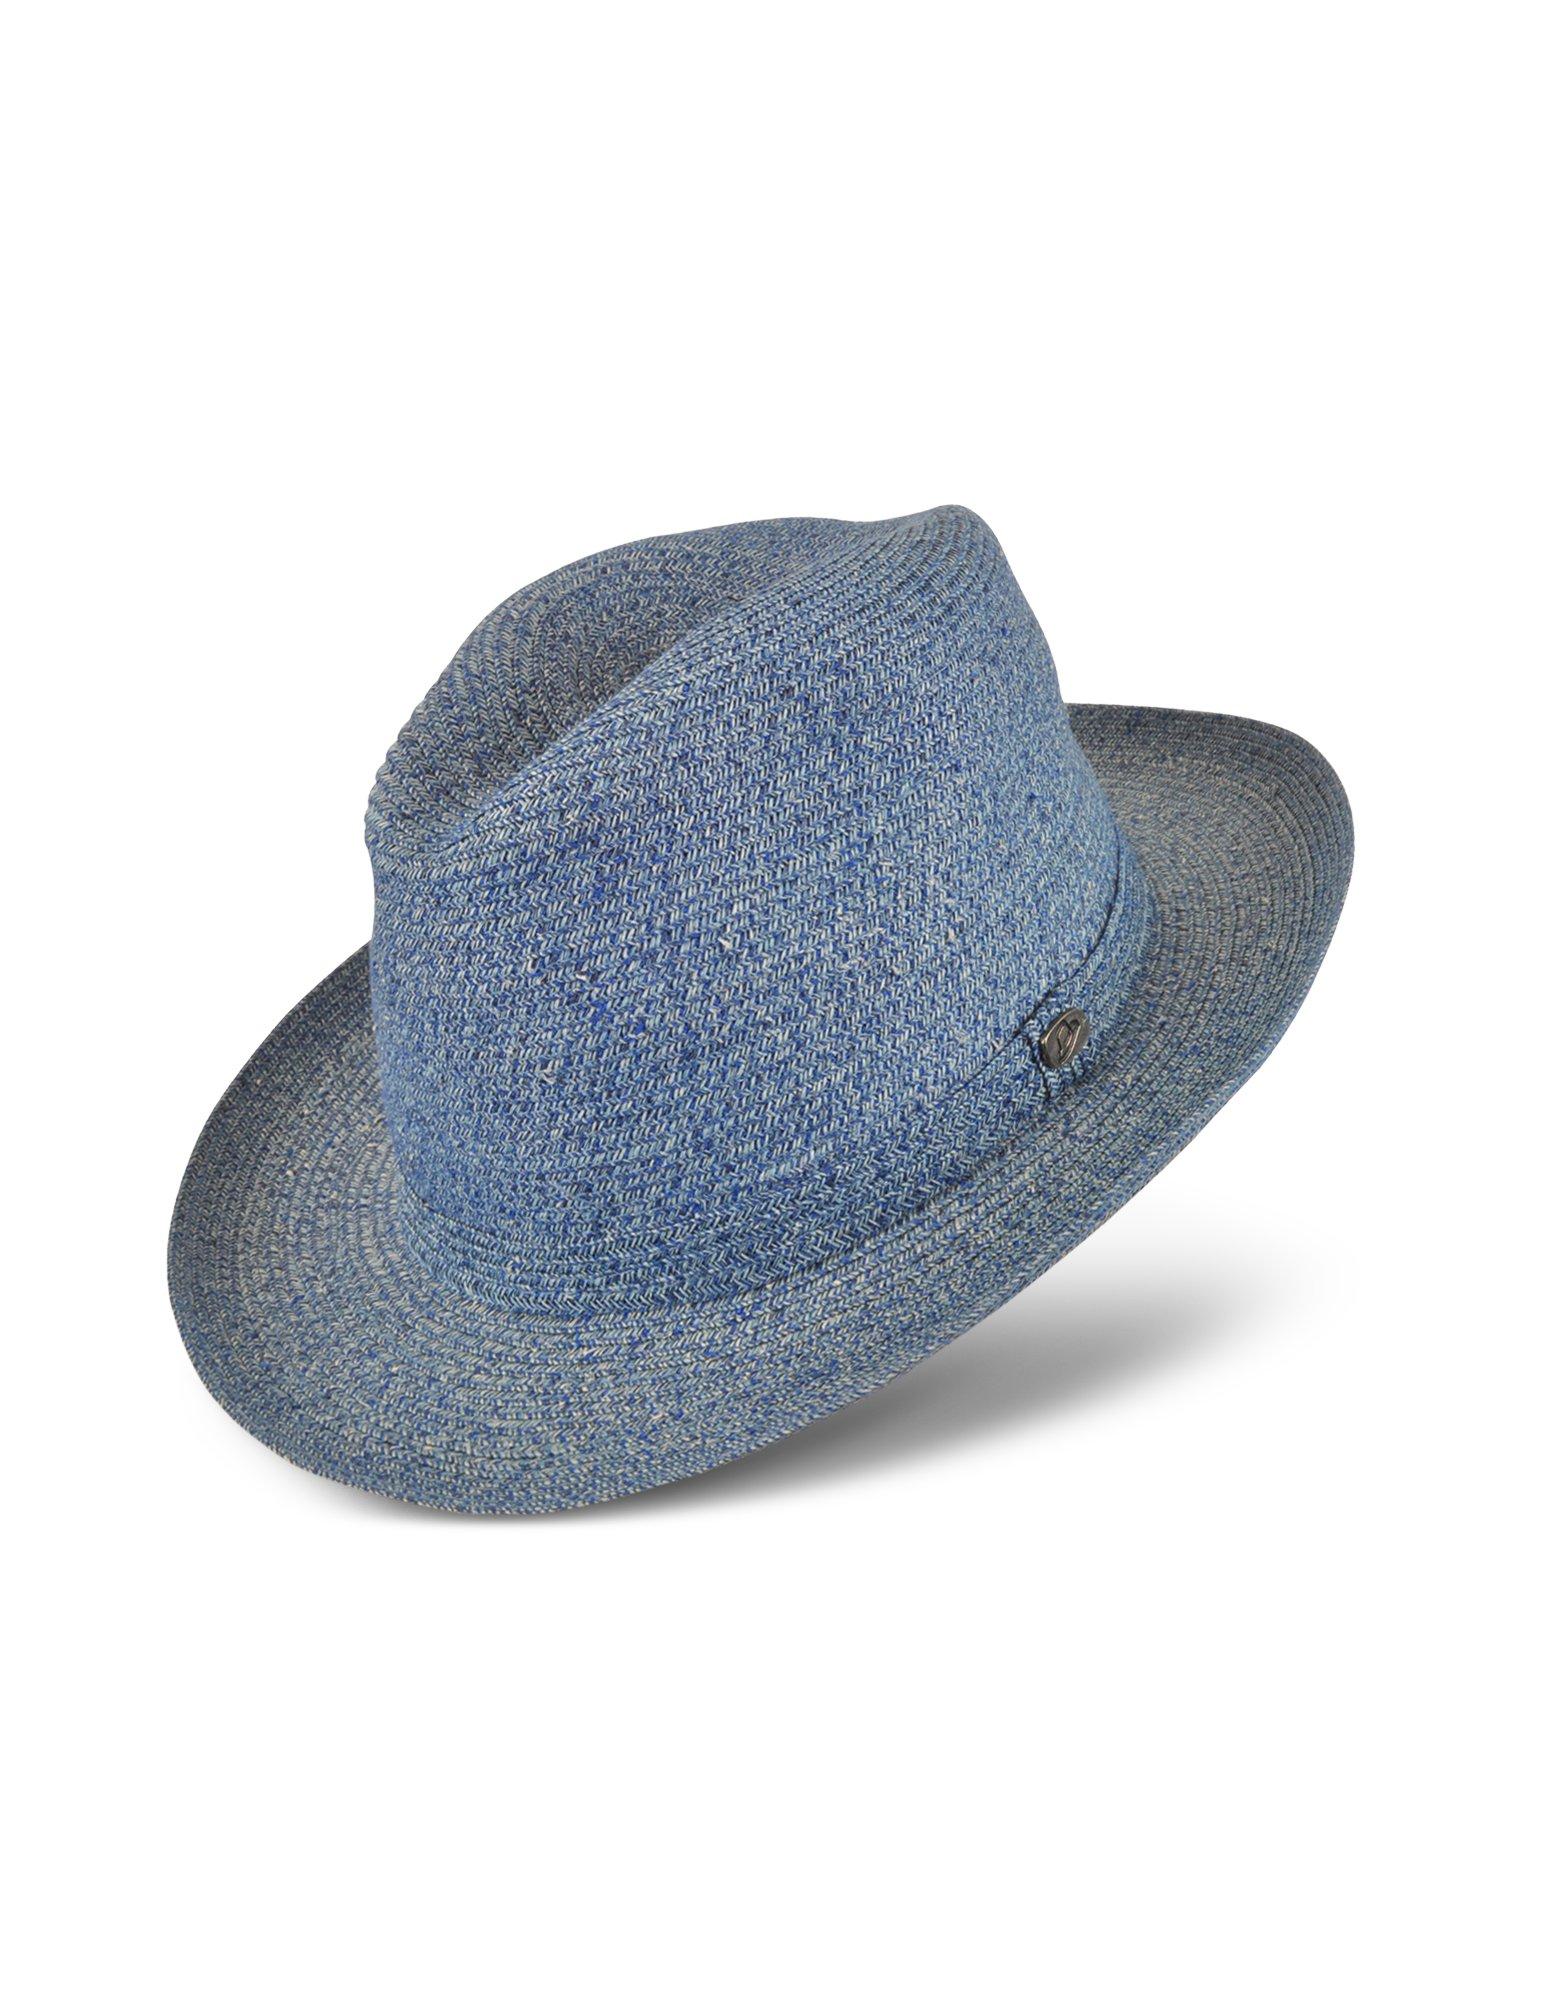 698d425f8cf Borsalino Signature Light Blue Paper Panama Hat in Blue for Men - Lyst